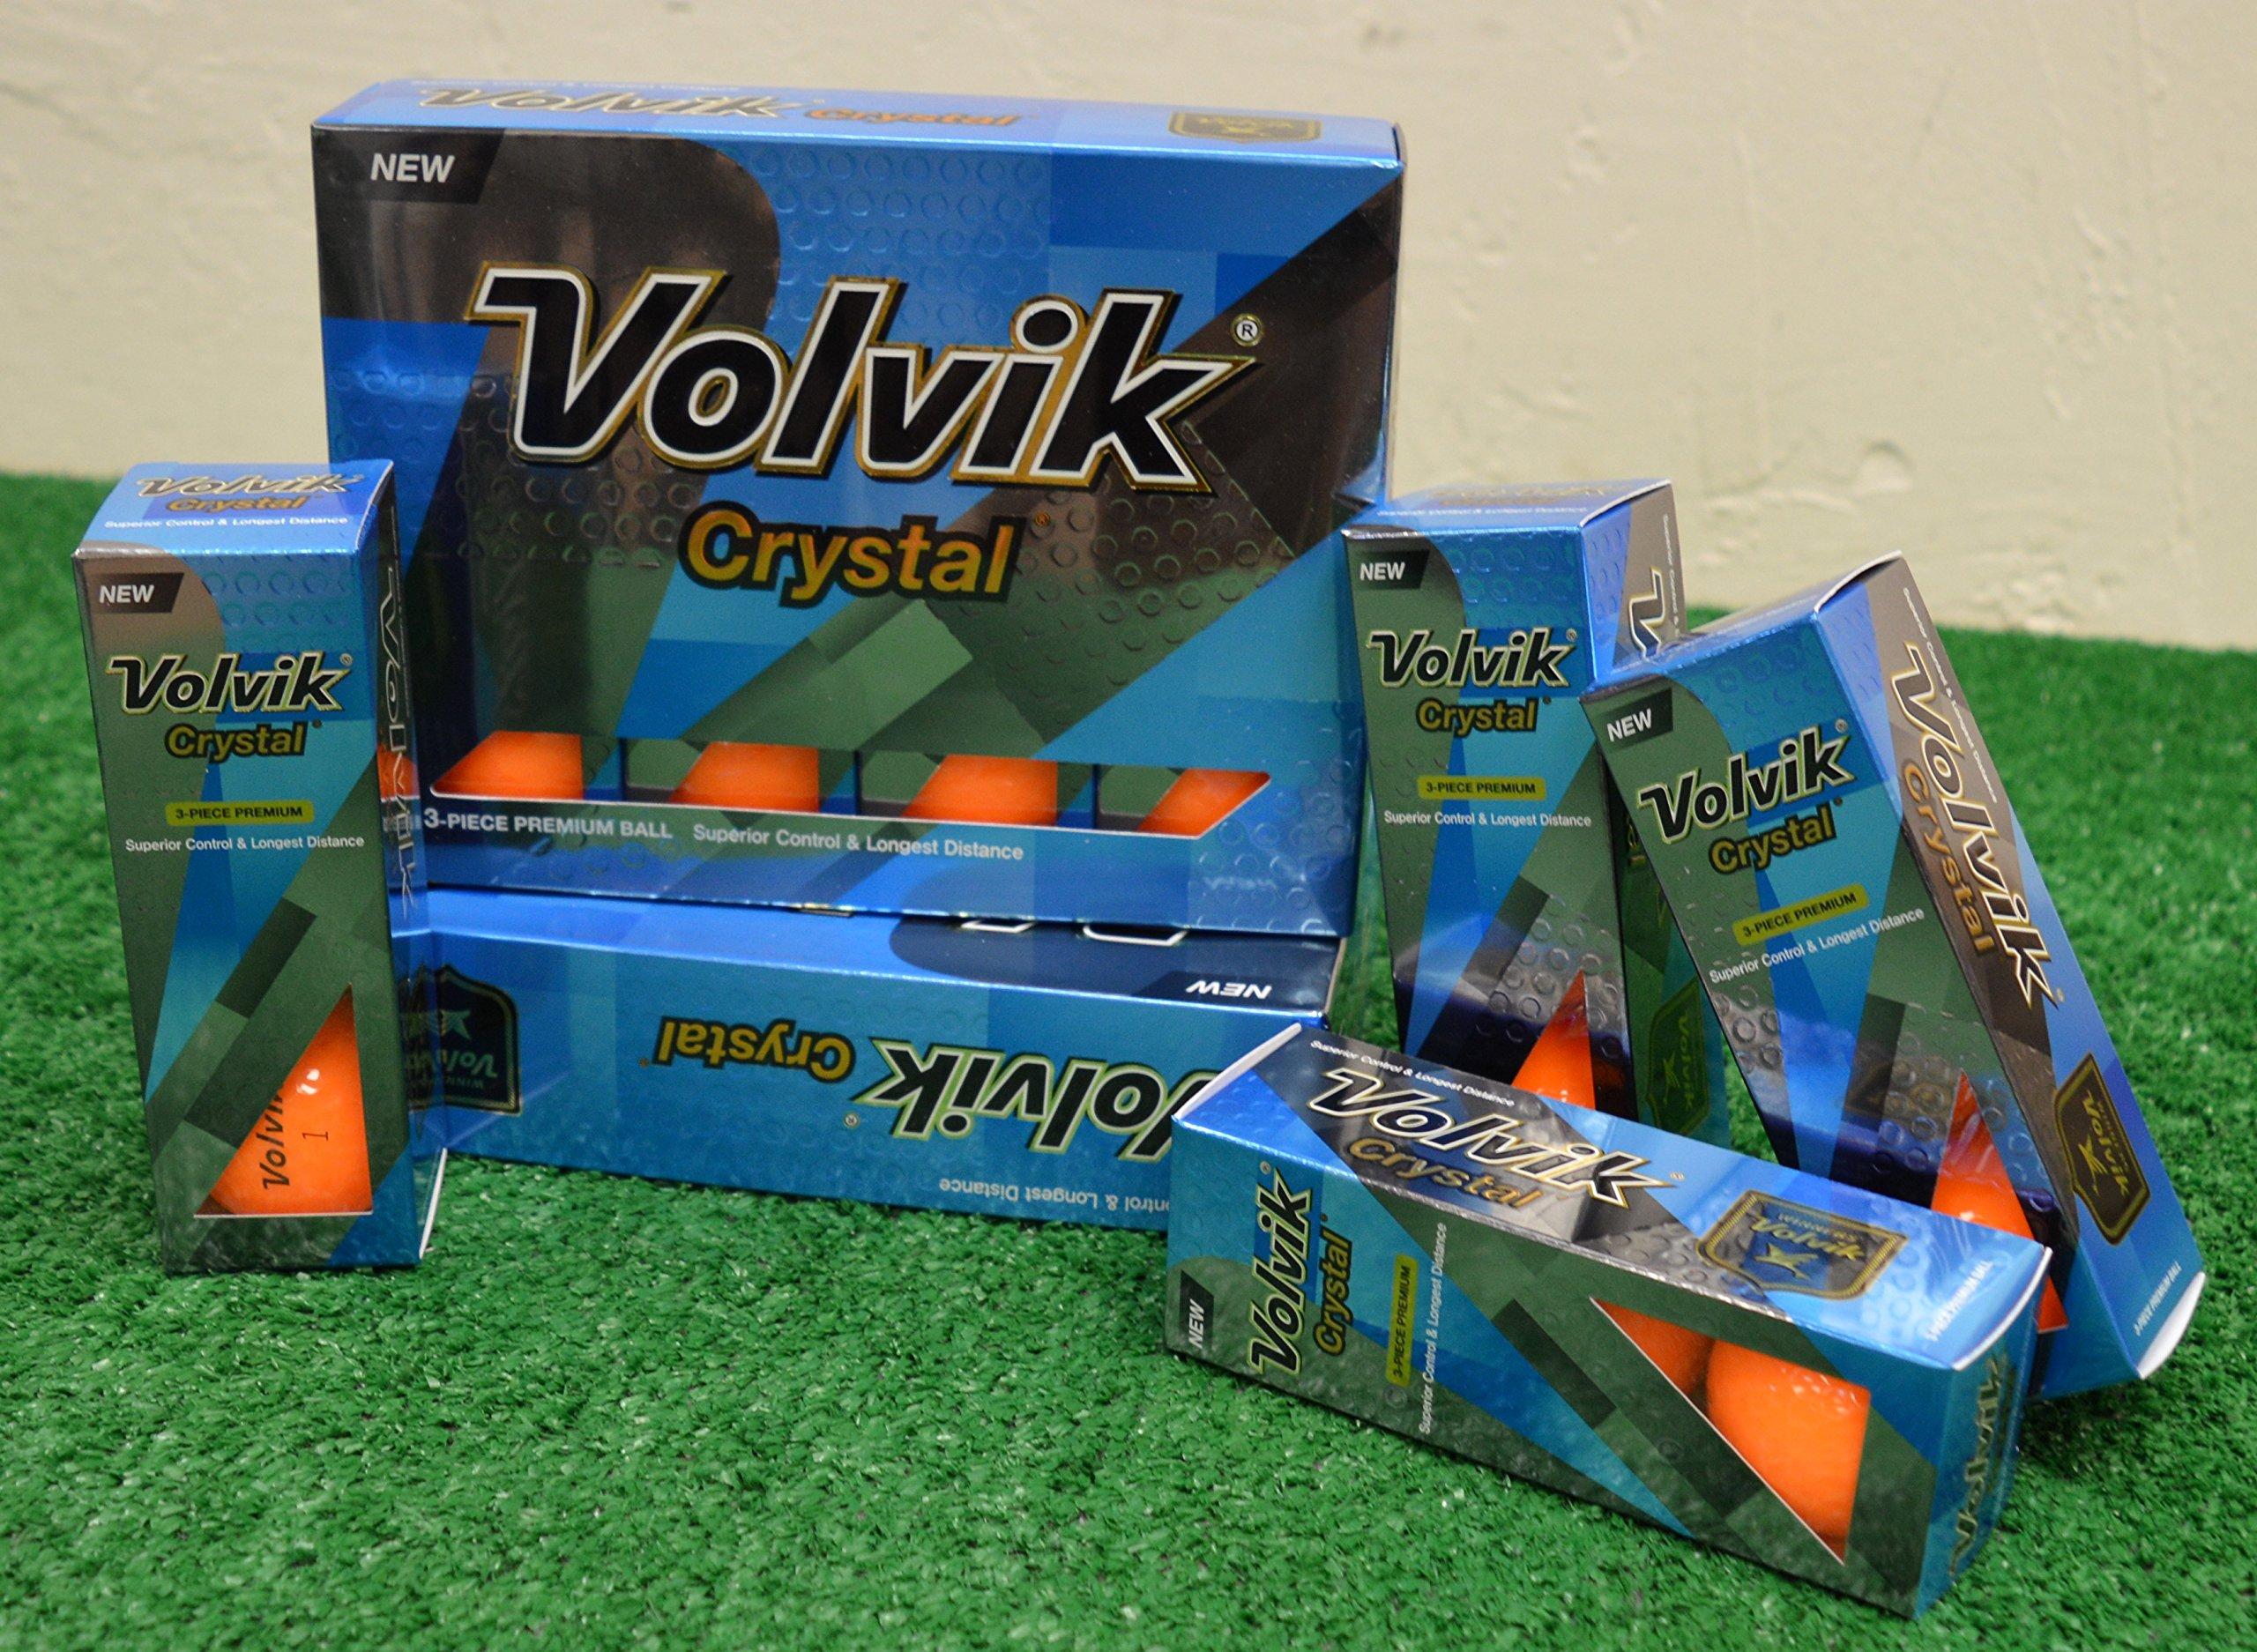 3 Dozen Volvik Crystal Orange Golf Balls - New in Box